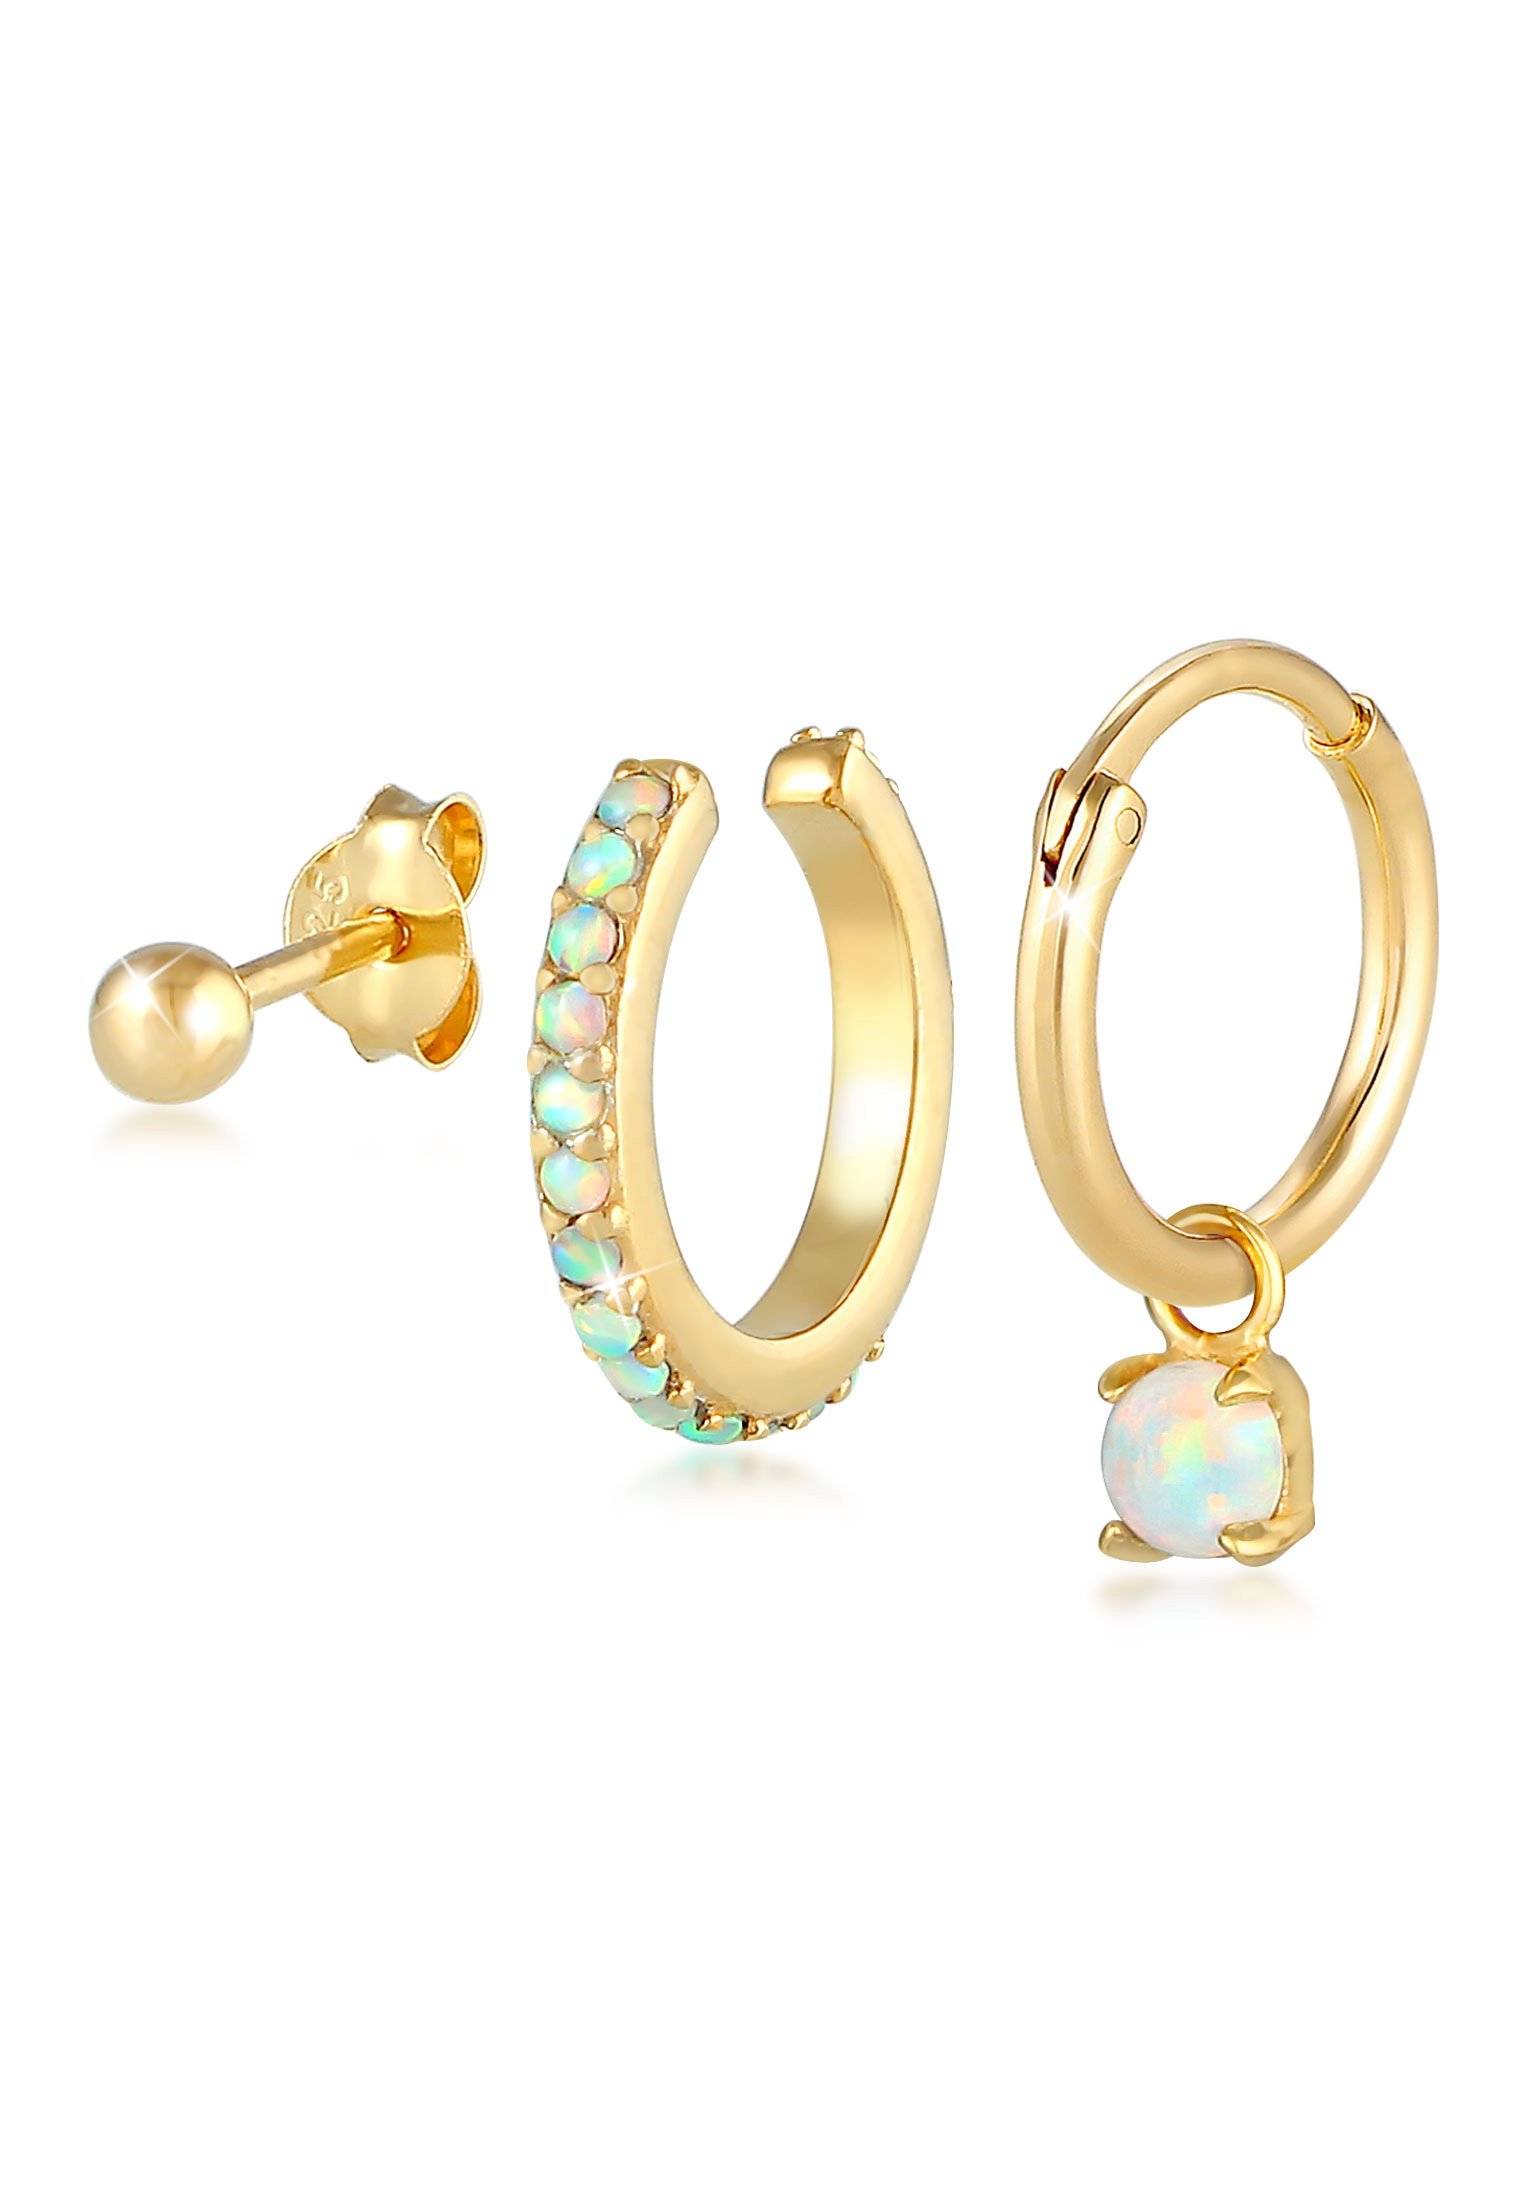 Ohrringset | Opal ( Weiß ) | 925 Sterling Silber vergoldet